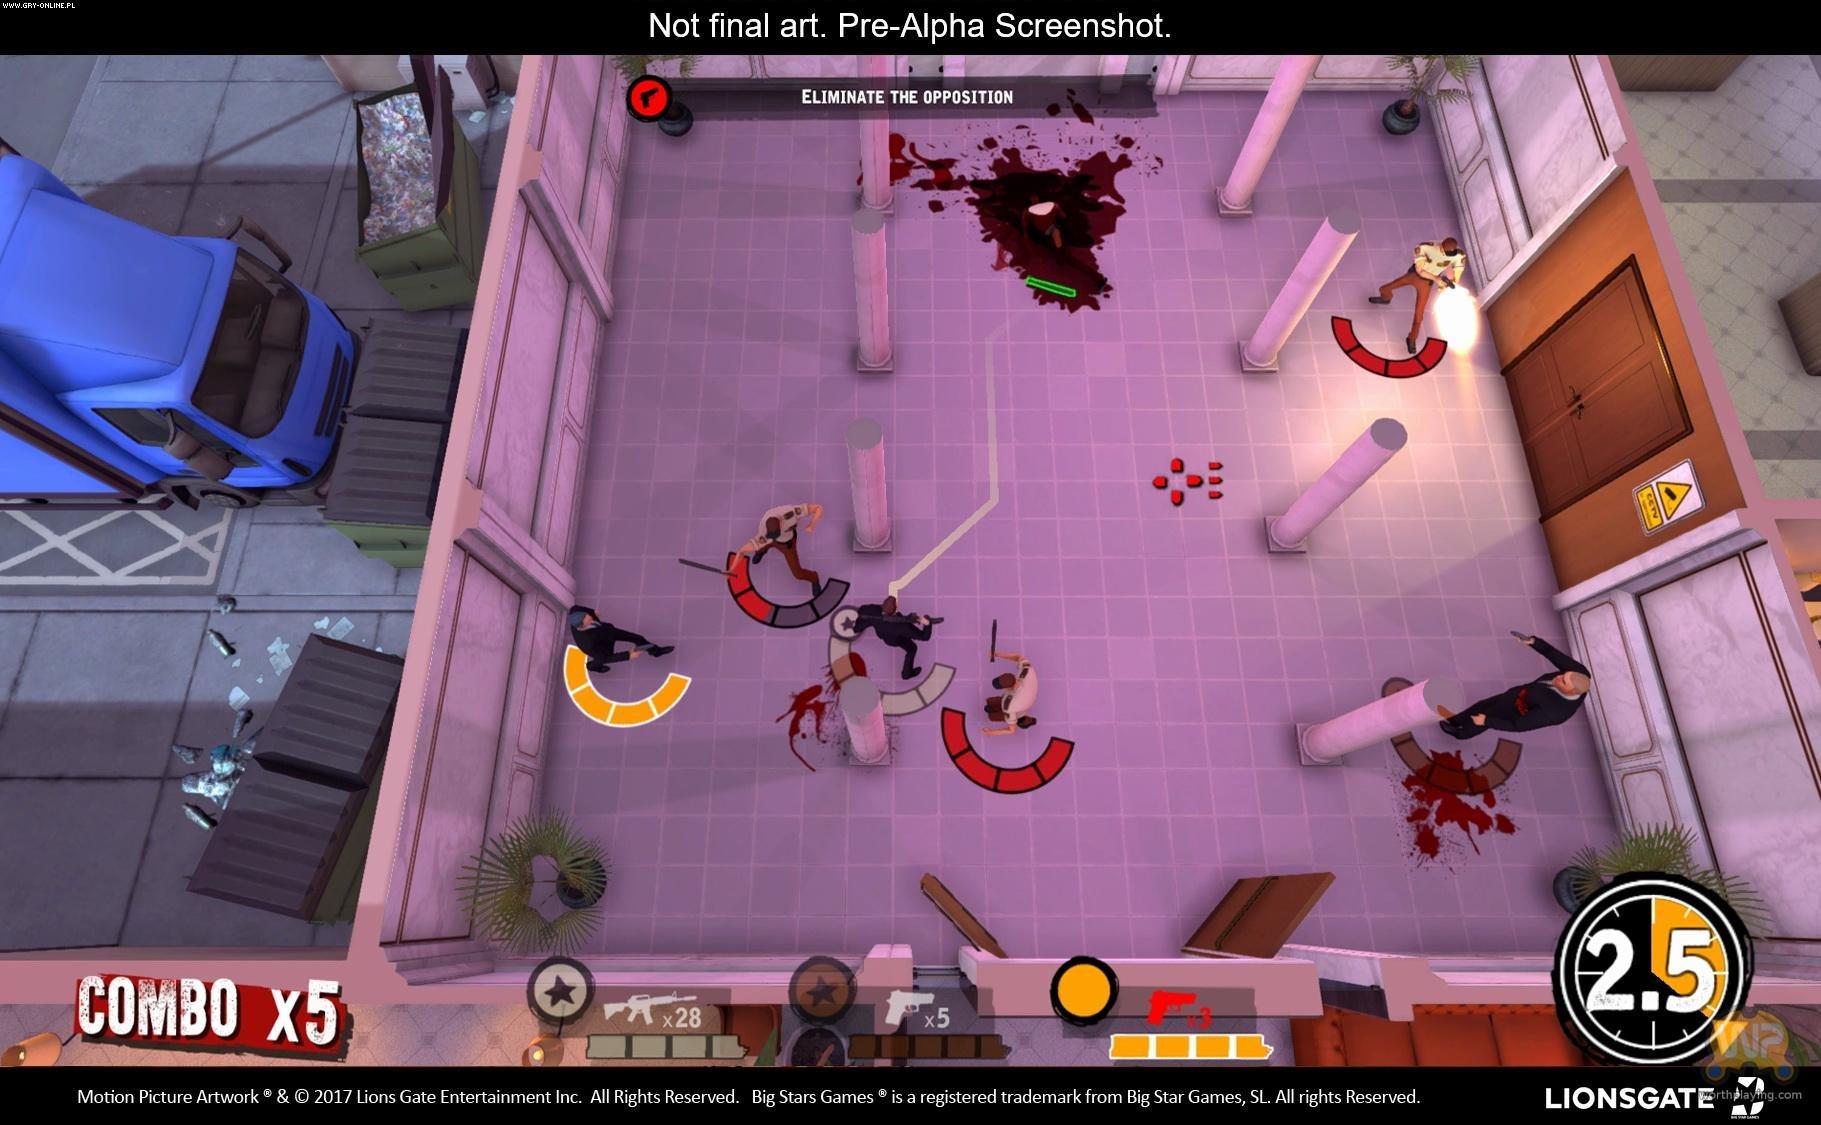 Reservoir Dogs: Bloody Days PC, XONE Games Image 2/6, Big Games, Big Star Games